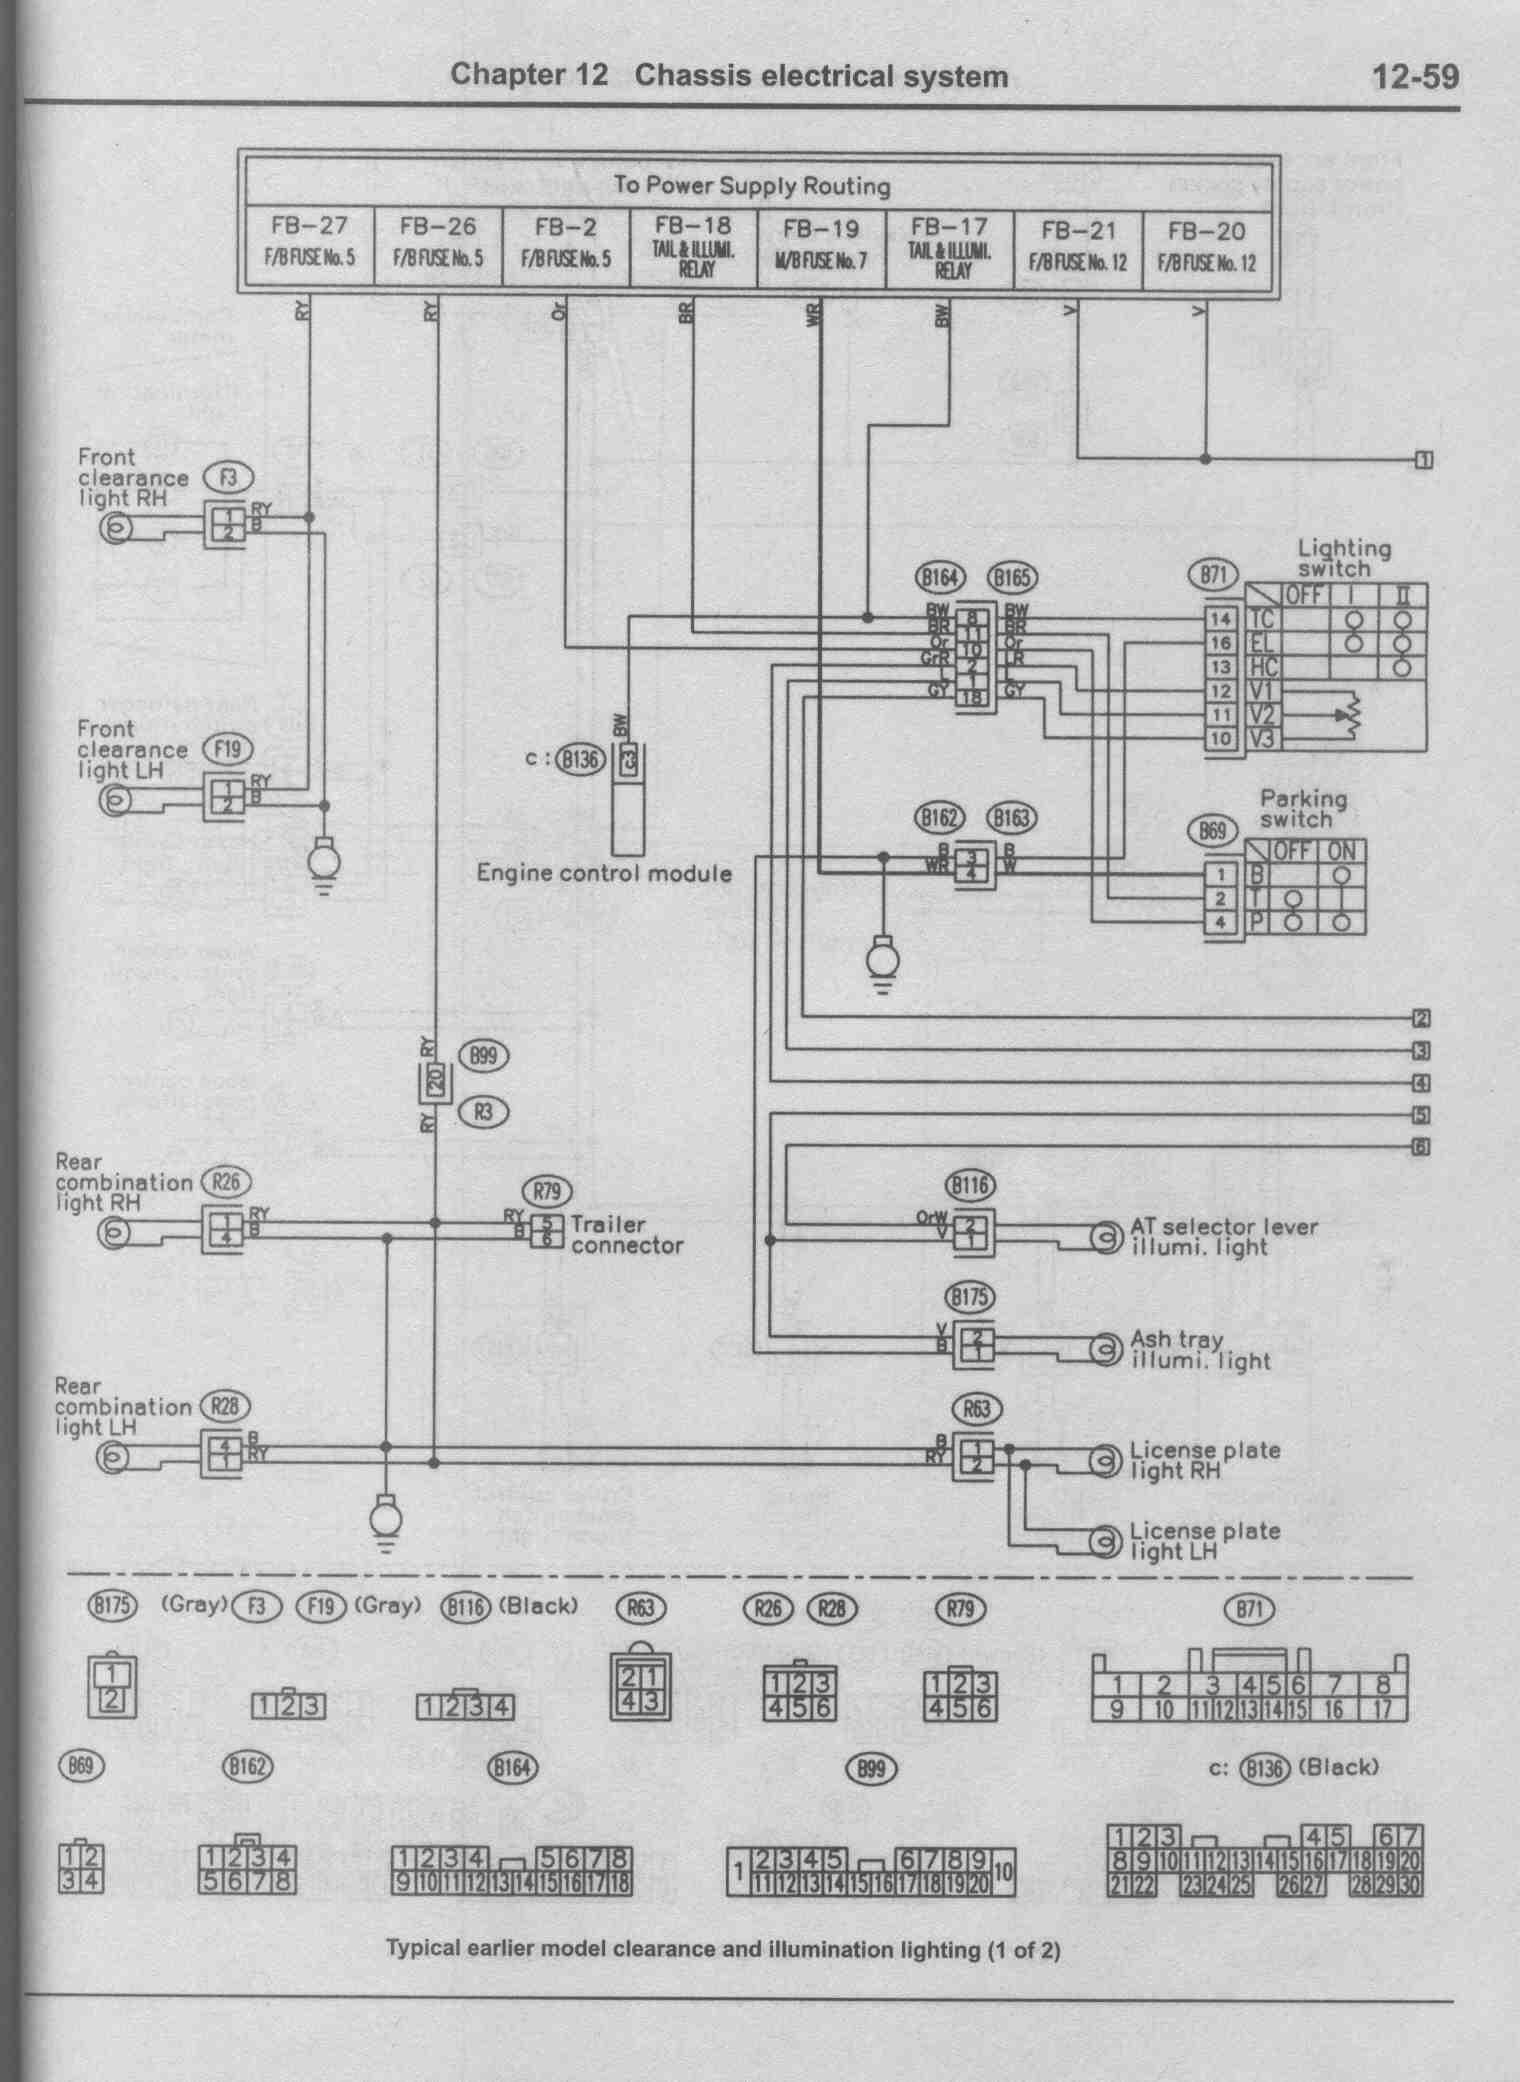 HL_7277] Outback Seat Wiring Diagram On 08 Subaru Forester Wiring Diagram  Download DiagramRemca Bocep Alia Phae Eatte Mohammedshrine Librar Wiring 101